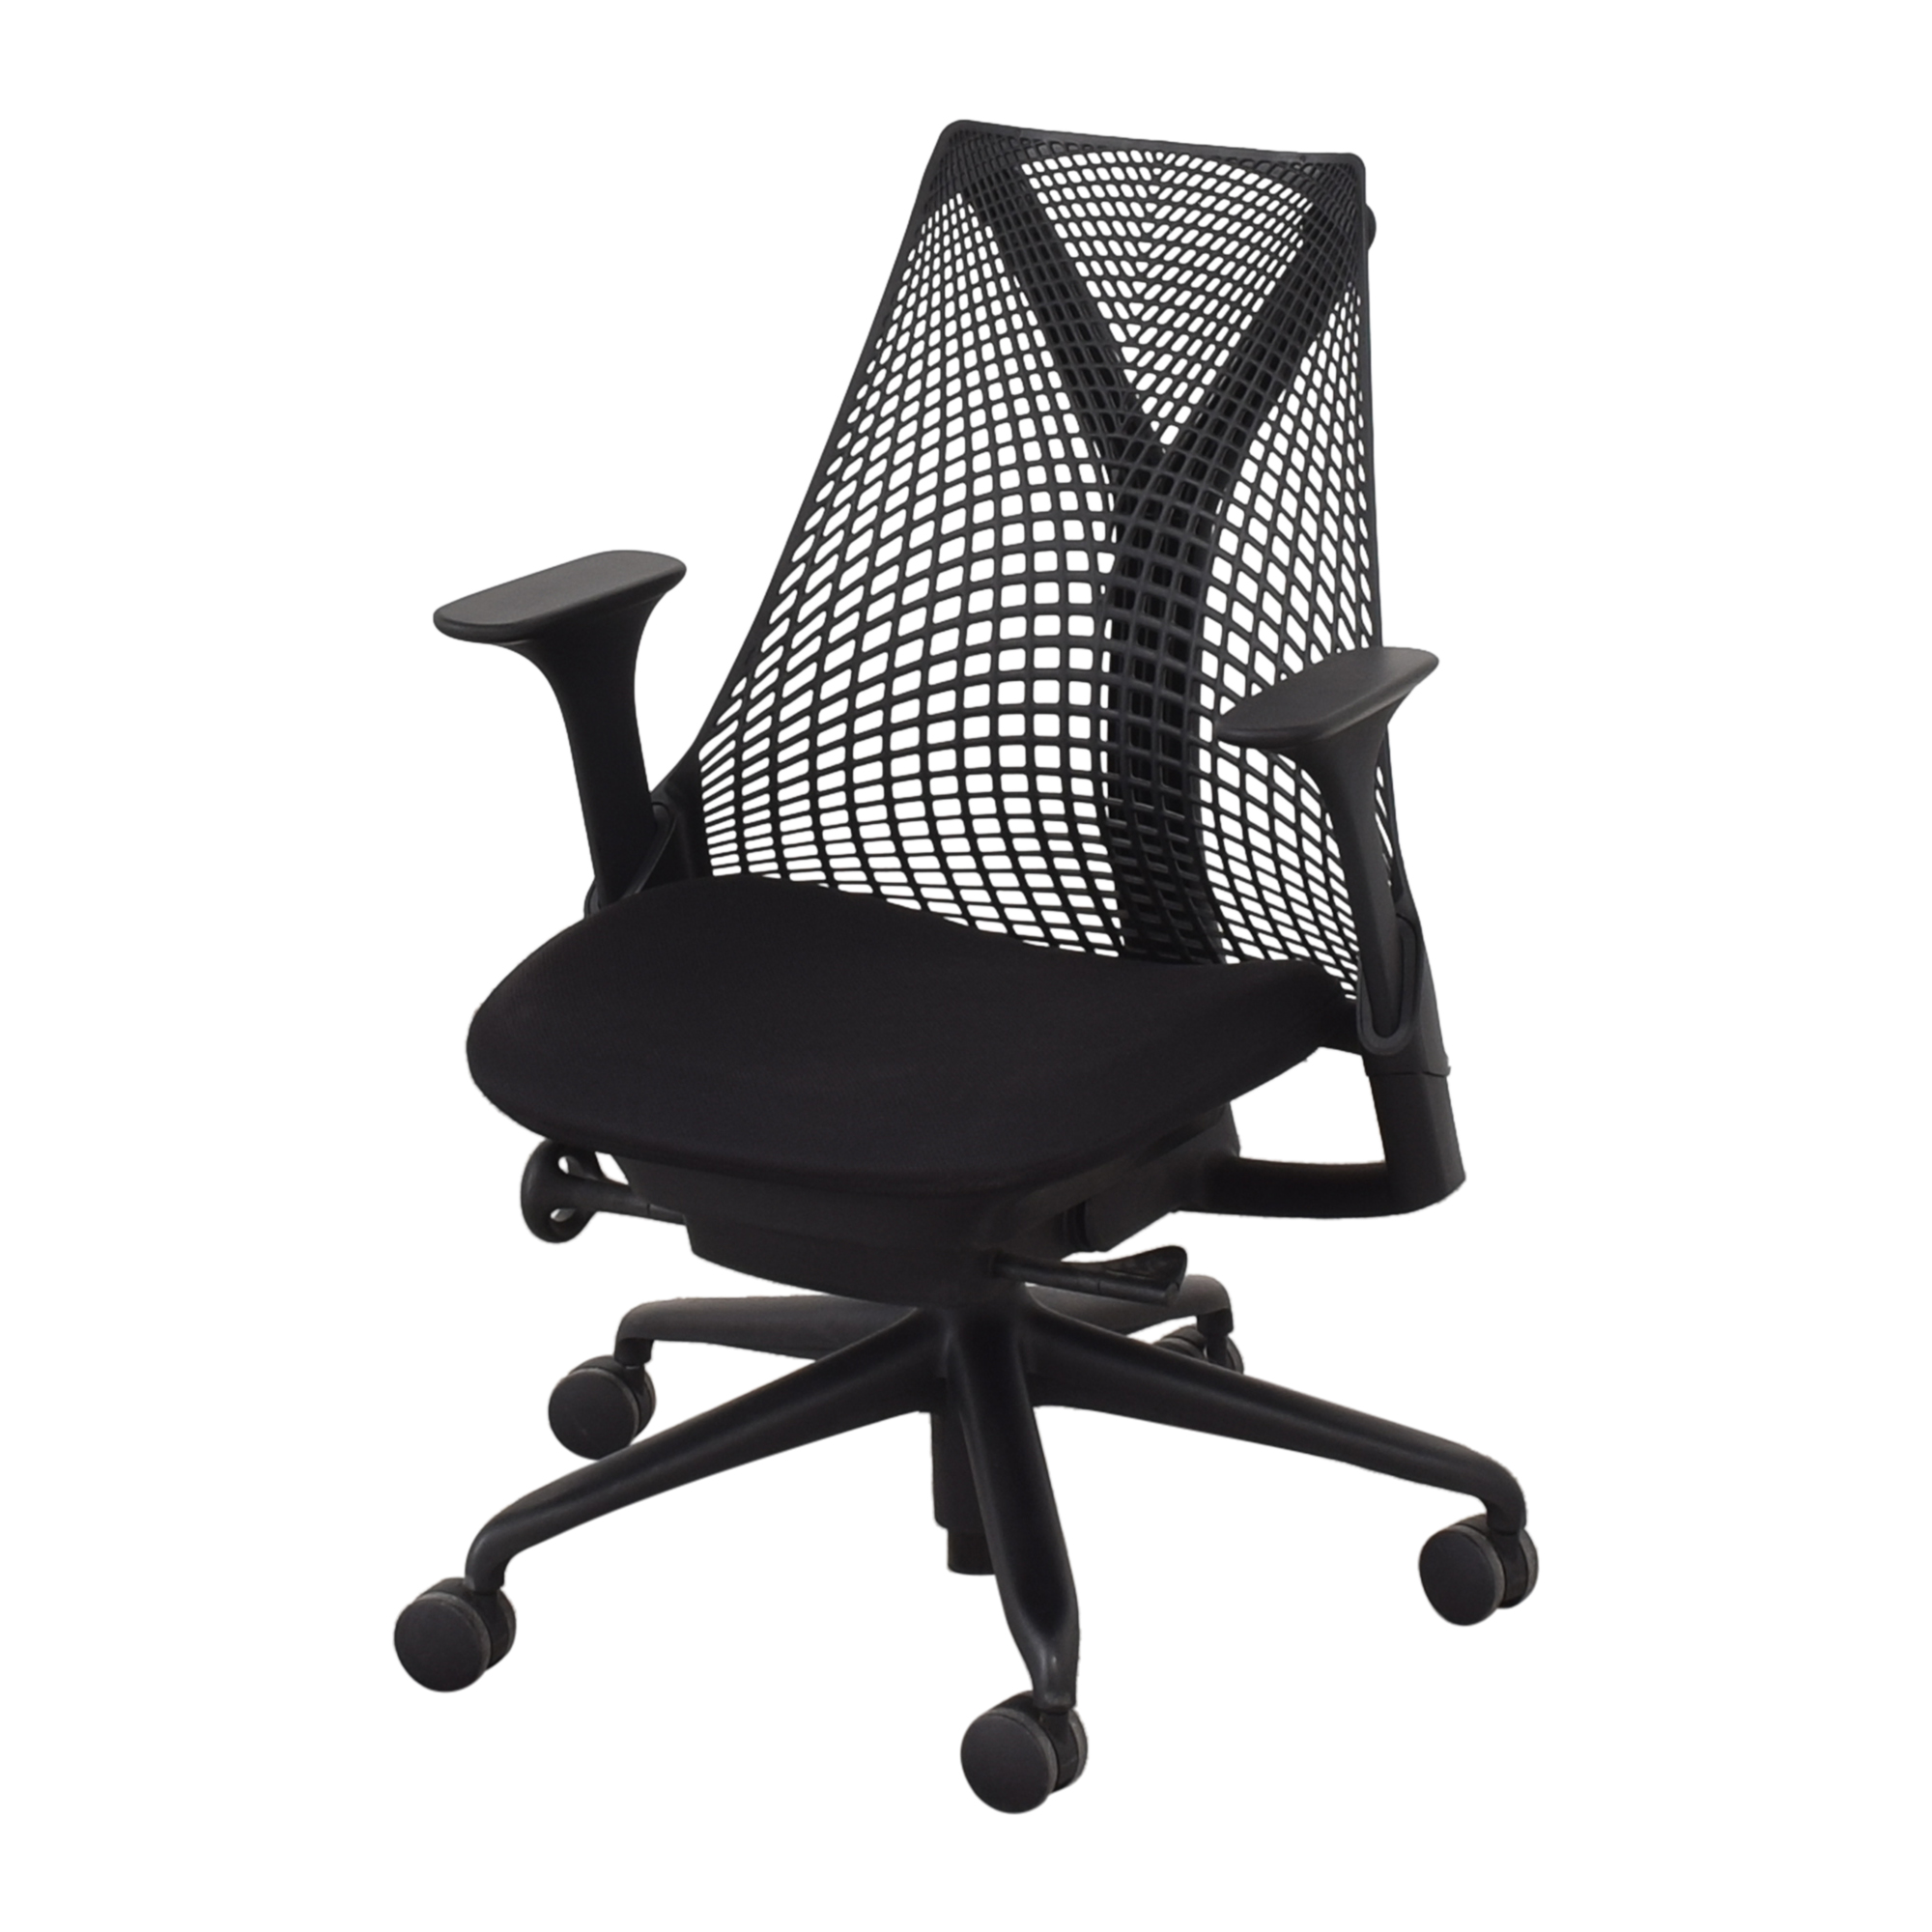 Herman Miller Herman Miller Sayl Chair ma